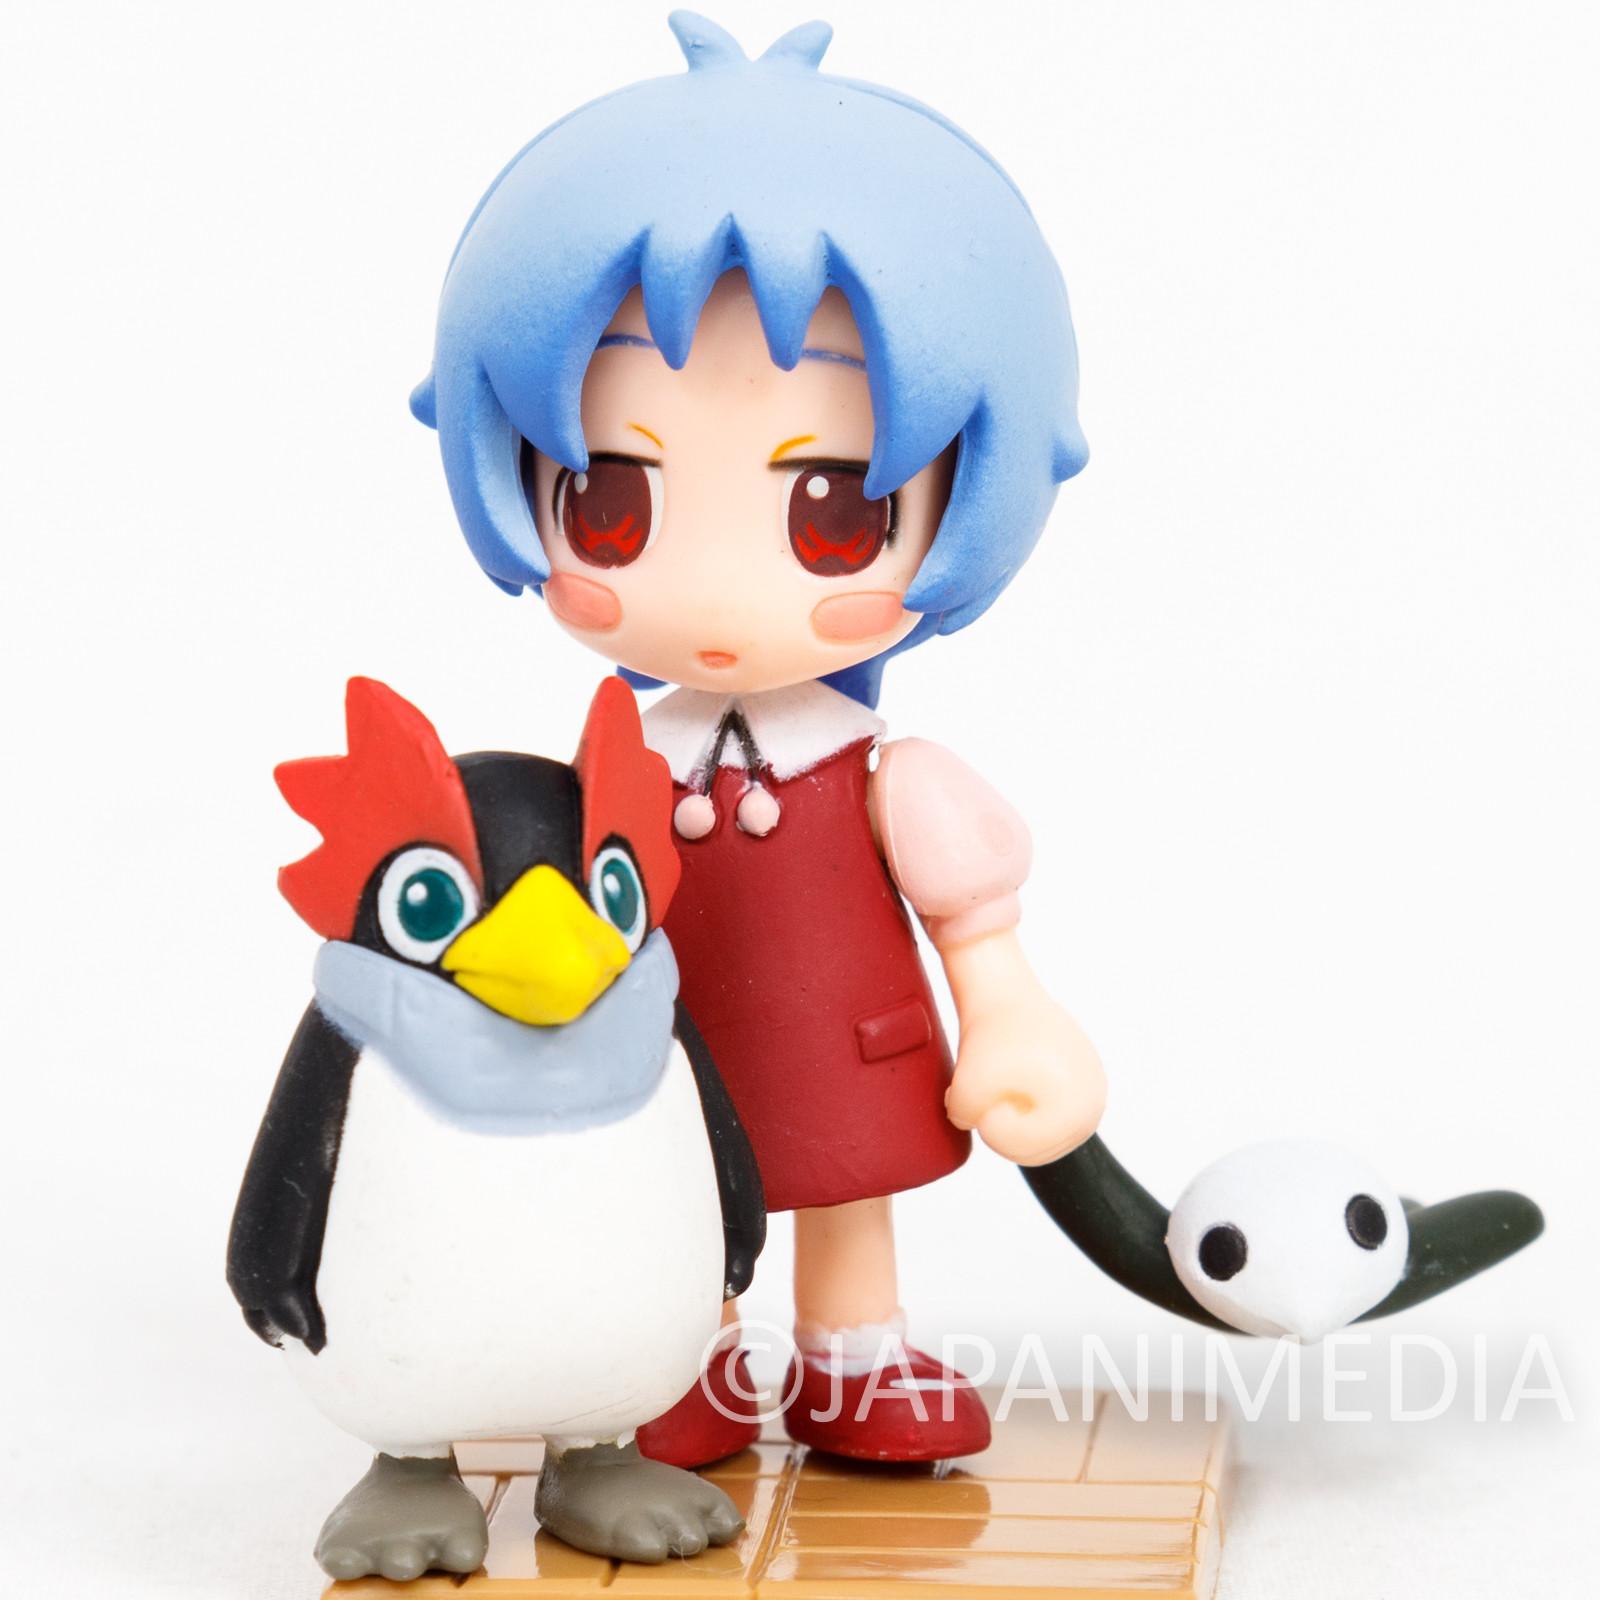 Evangelion Rei Ayanami Childhood Figure Petit Eva Series JAPAN ANIME